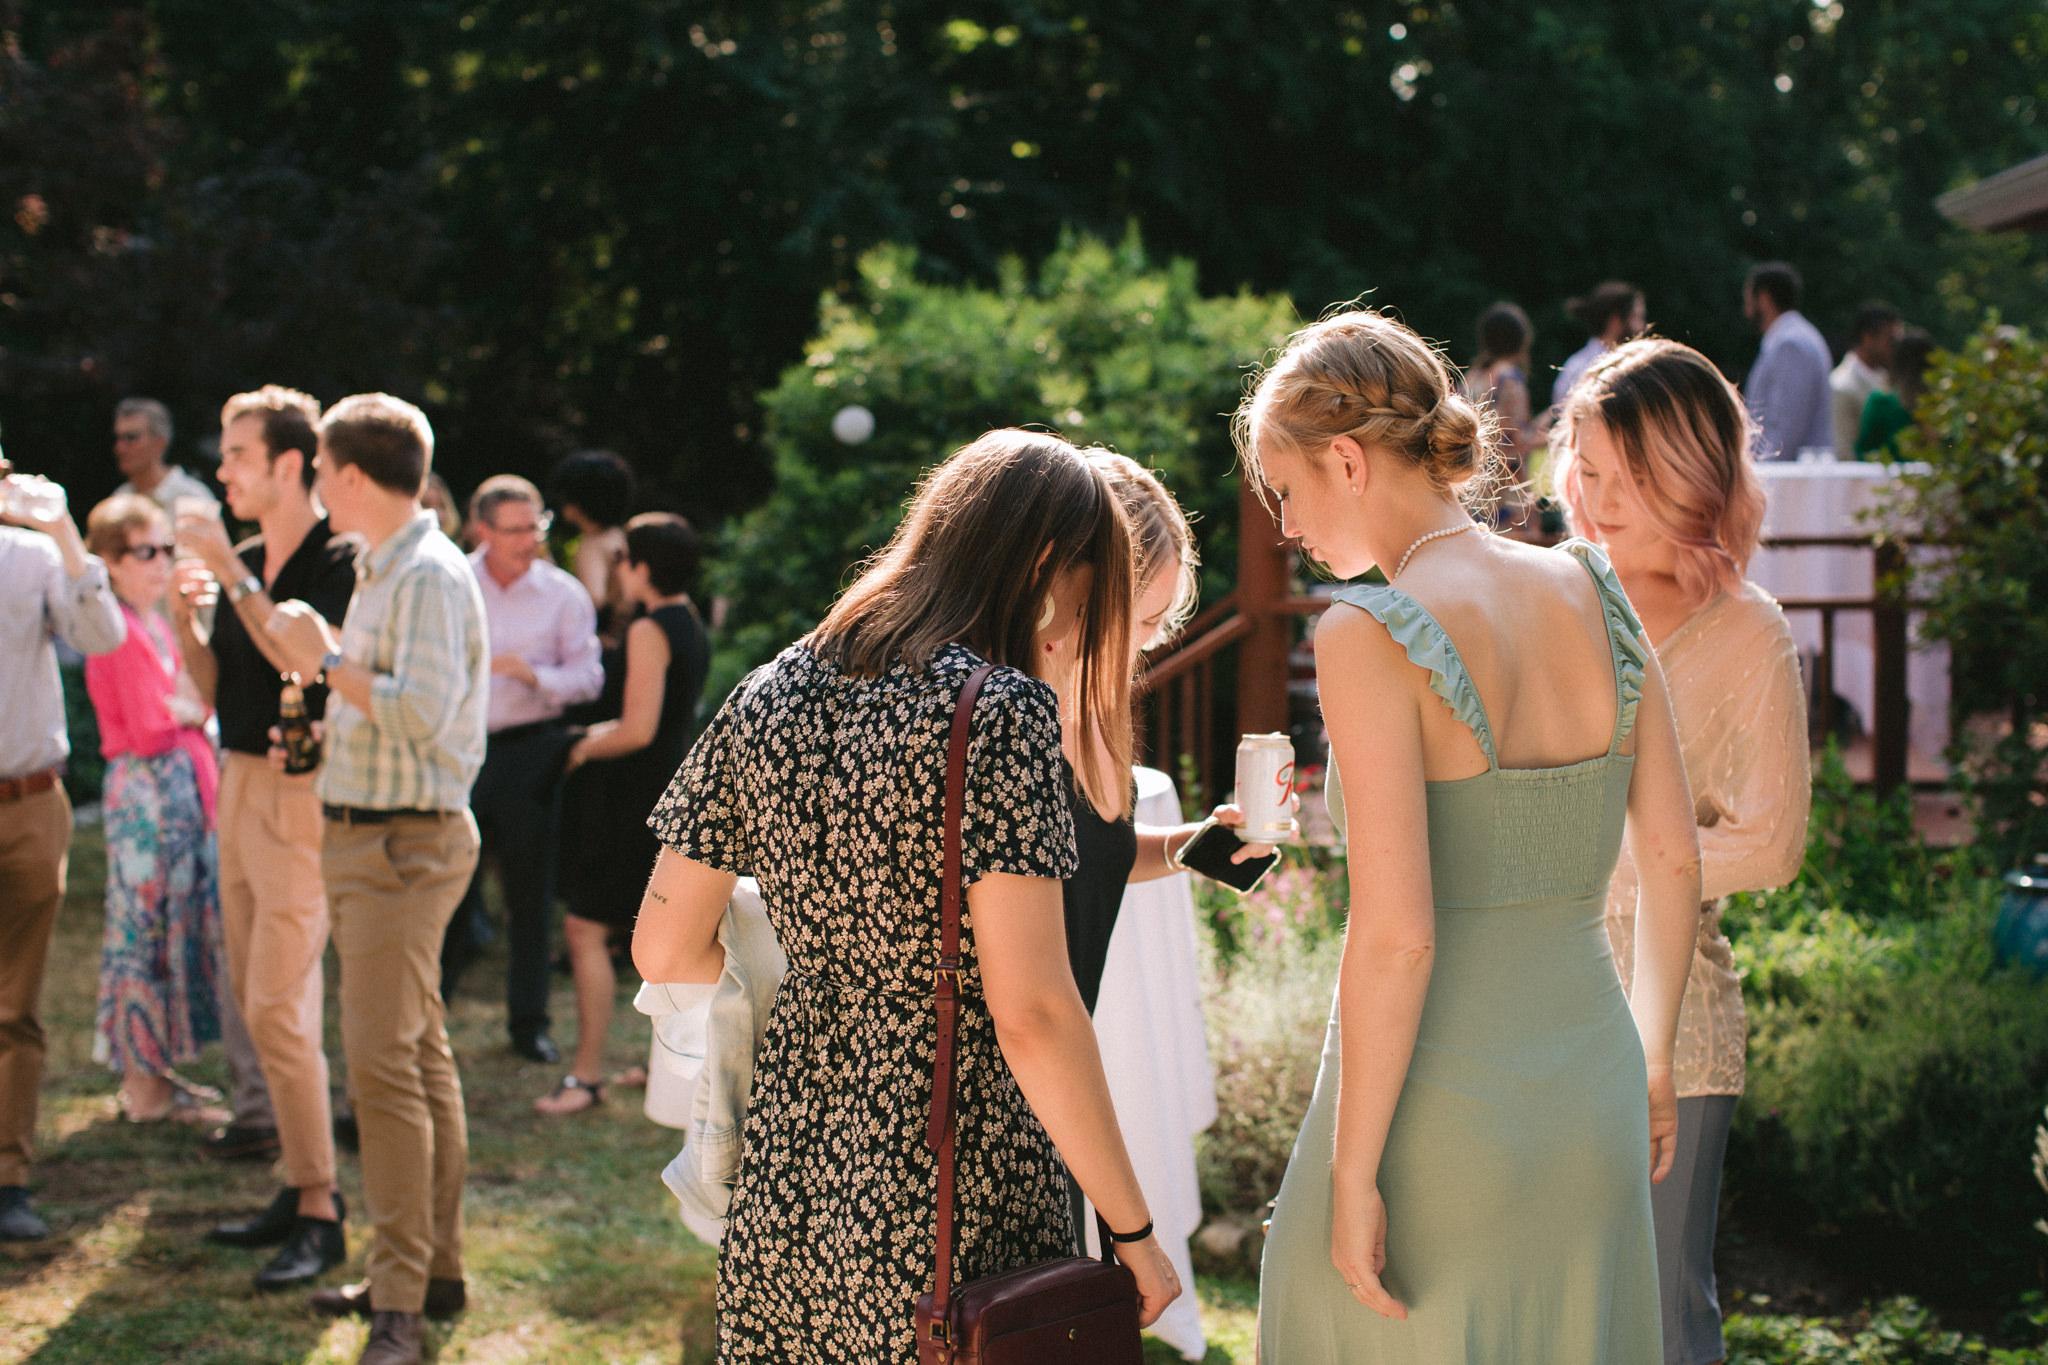 Backyard-Bainbridge-Island-Wedding-Alycia-Lovell-Photography-72.JPG